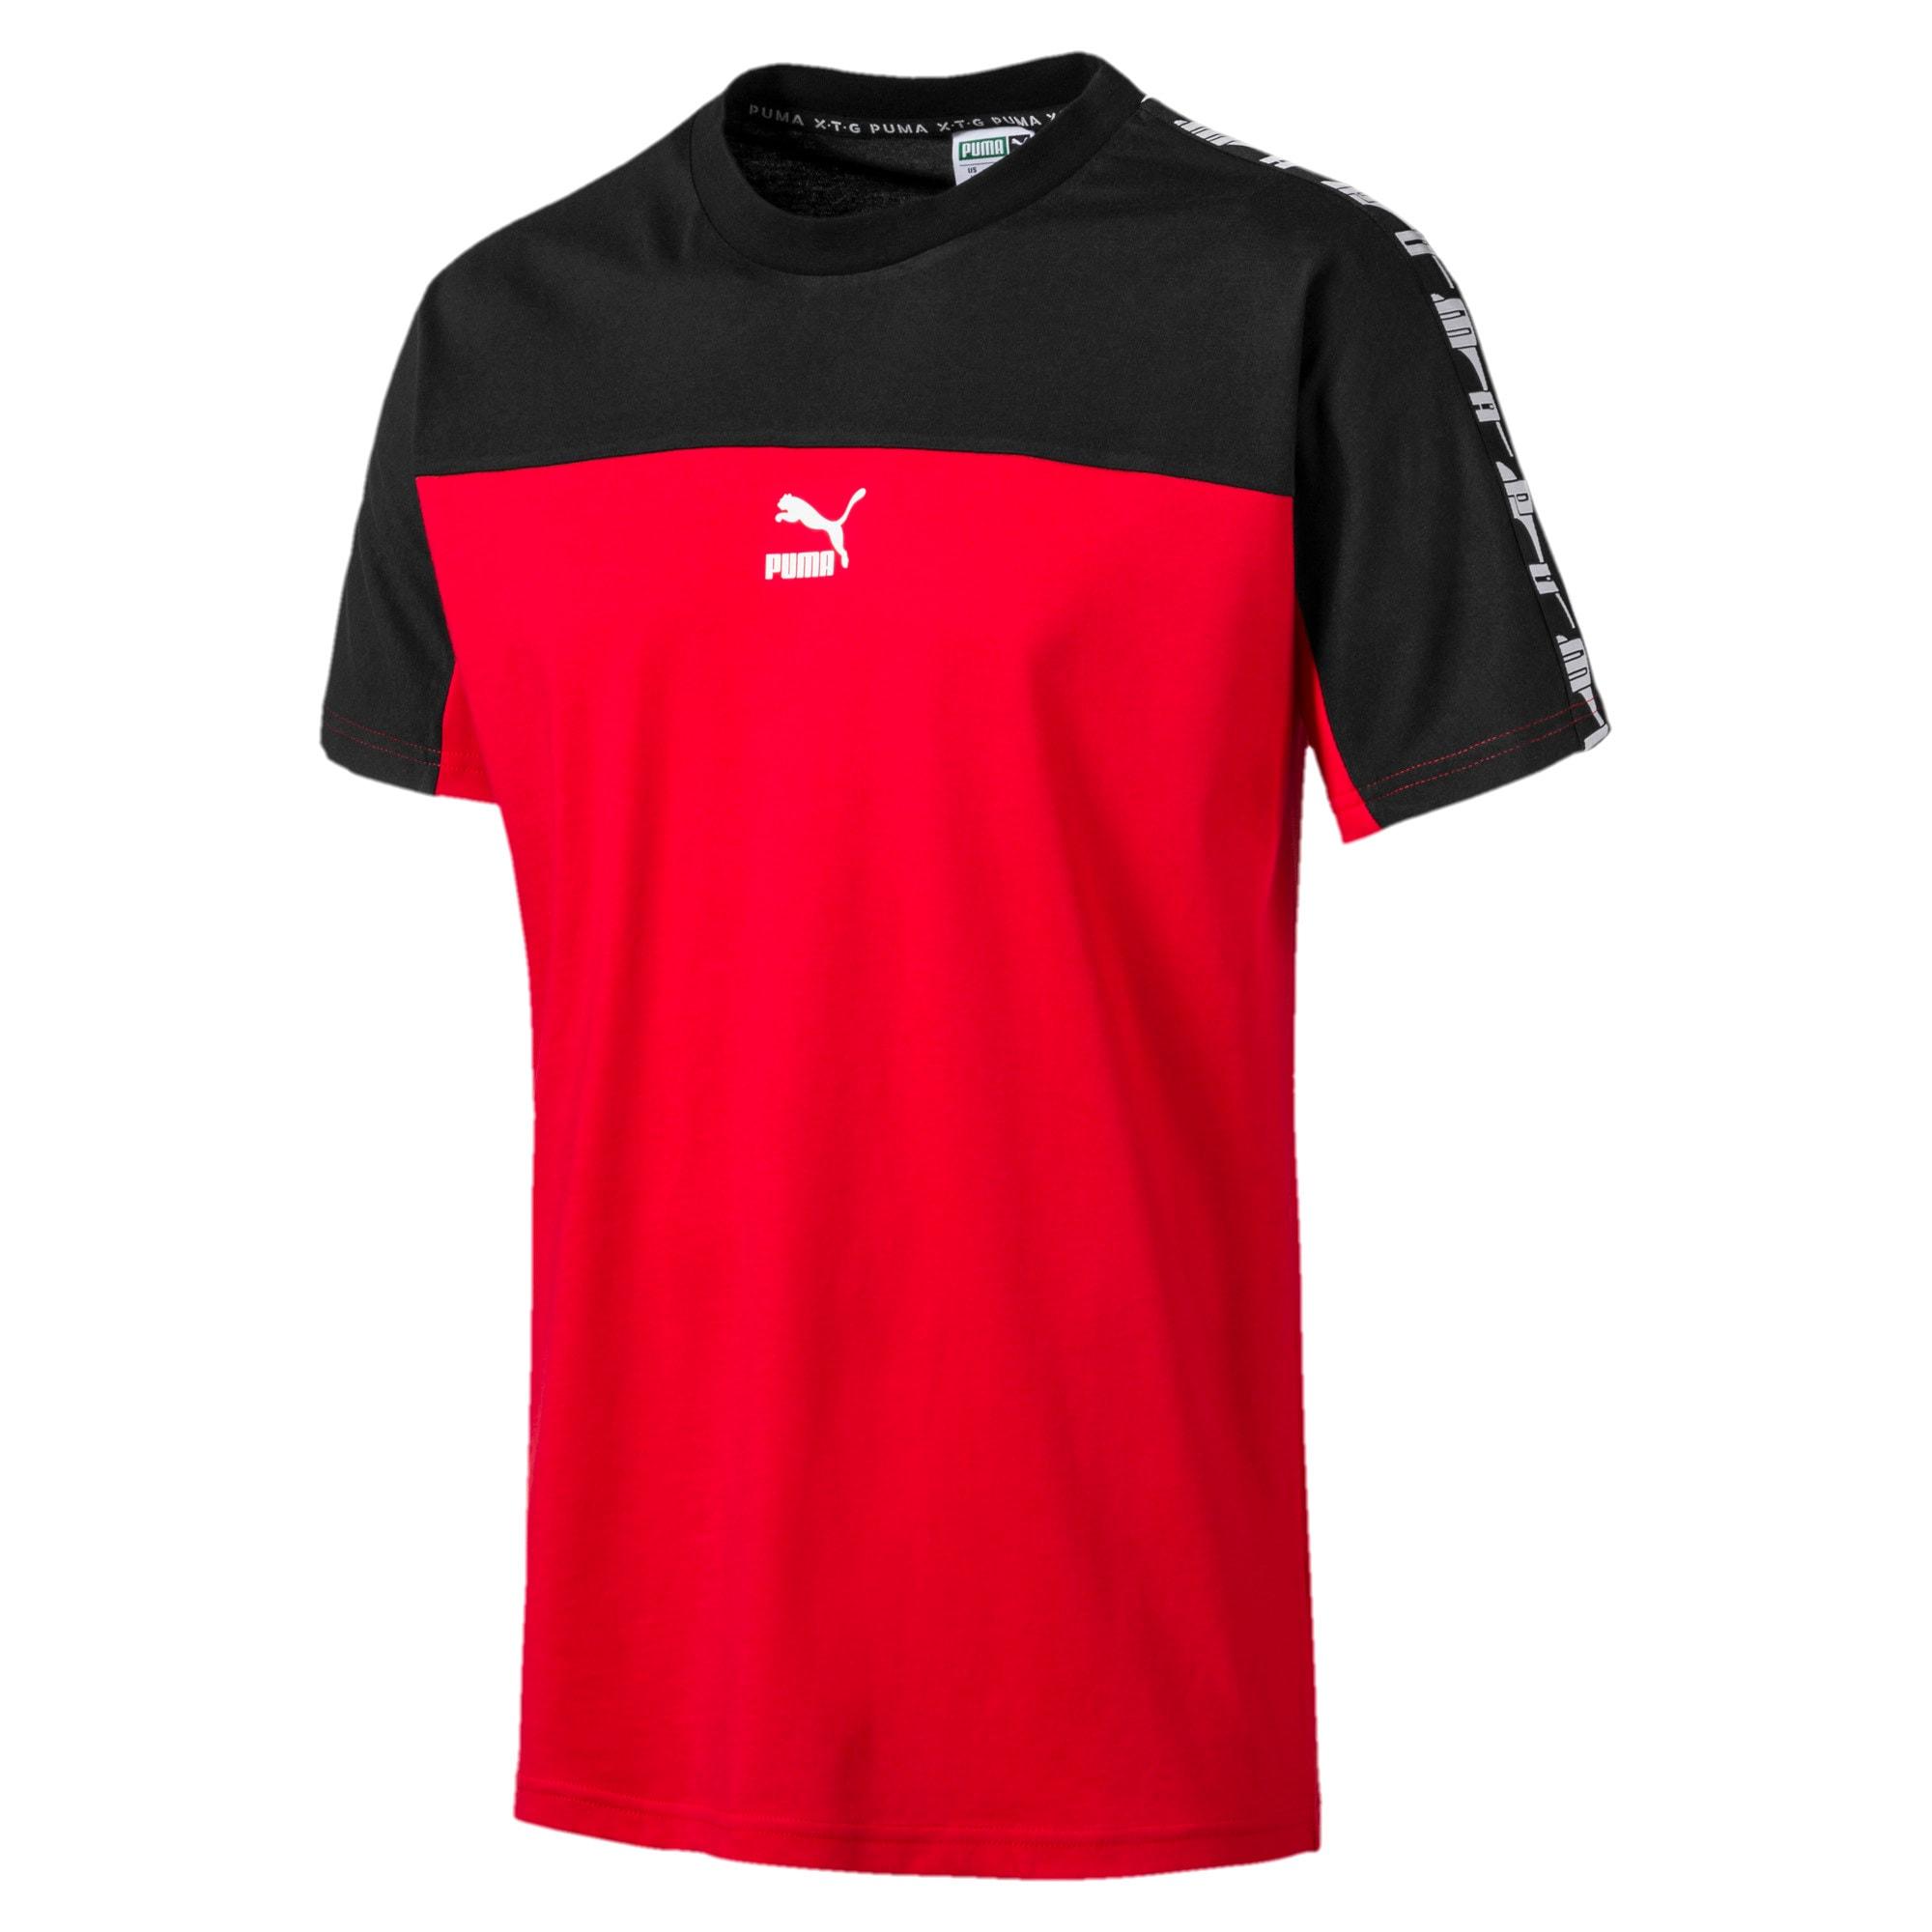 Thumbnail 1 of PUMA XTG SS Tシャツ, High Risk Red, medium-JPN